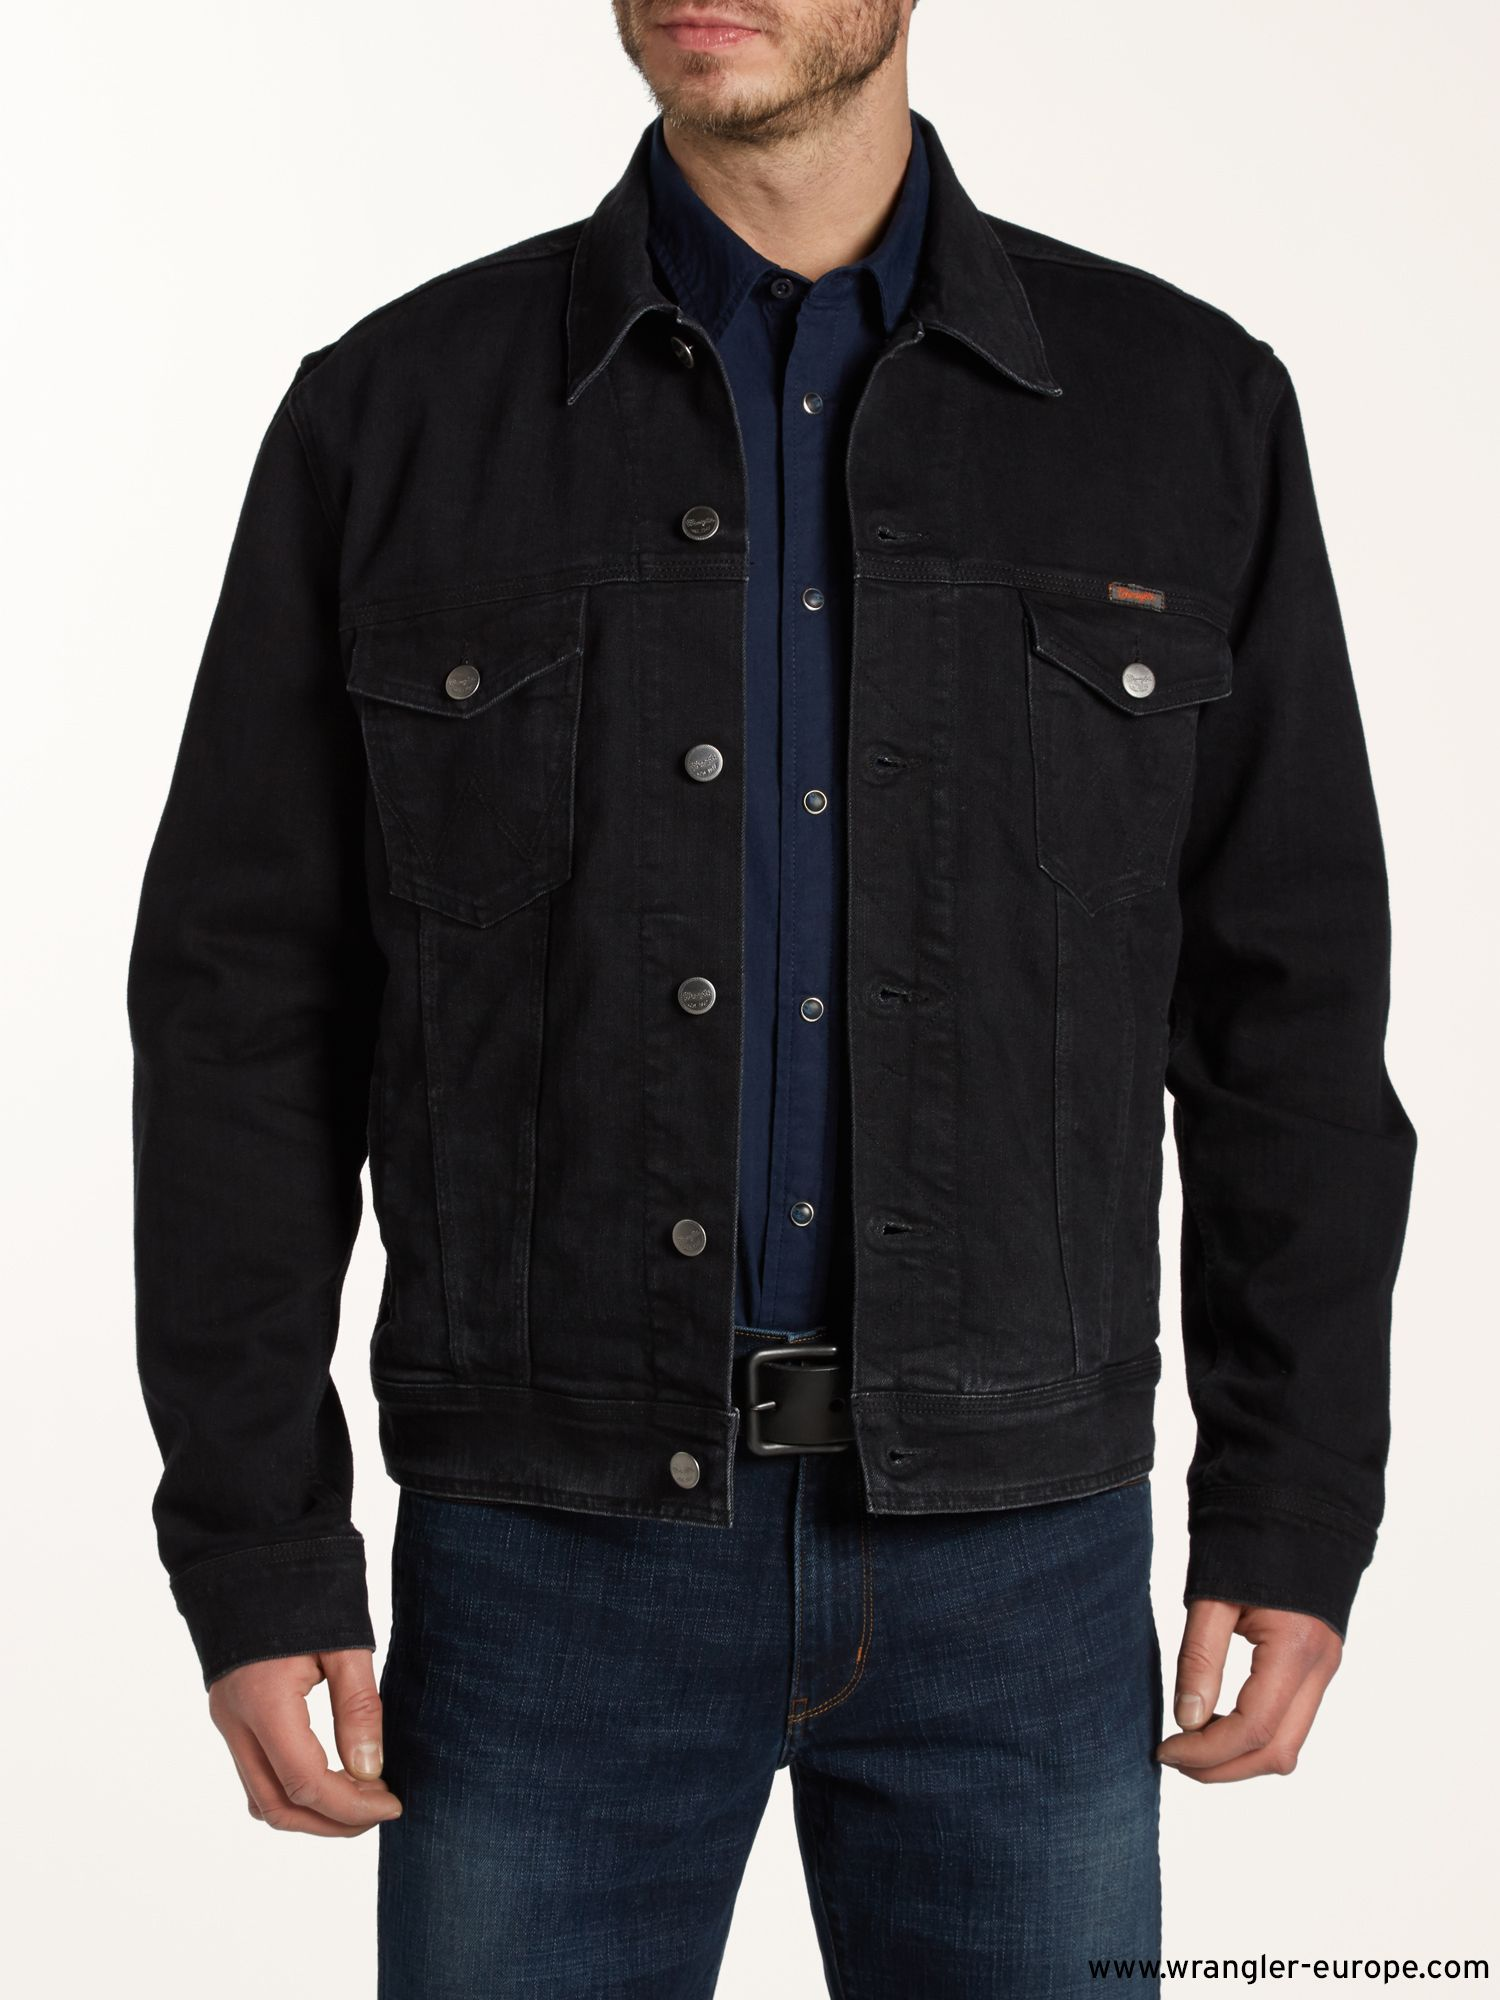 Wrangler F W 14 Collection Shop At Www Wrangler Com Boys Dress Menswear Jacket Style [ 2000 x 1500 Pixel ]